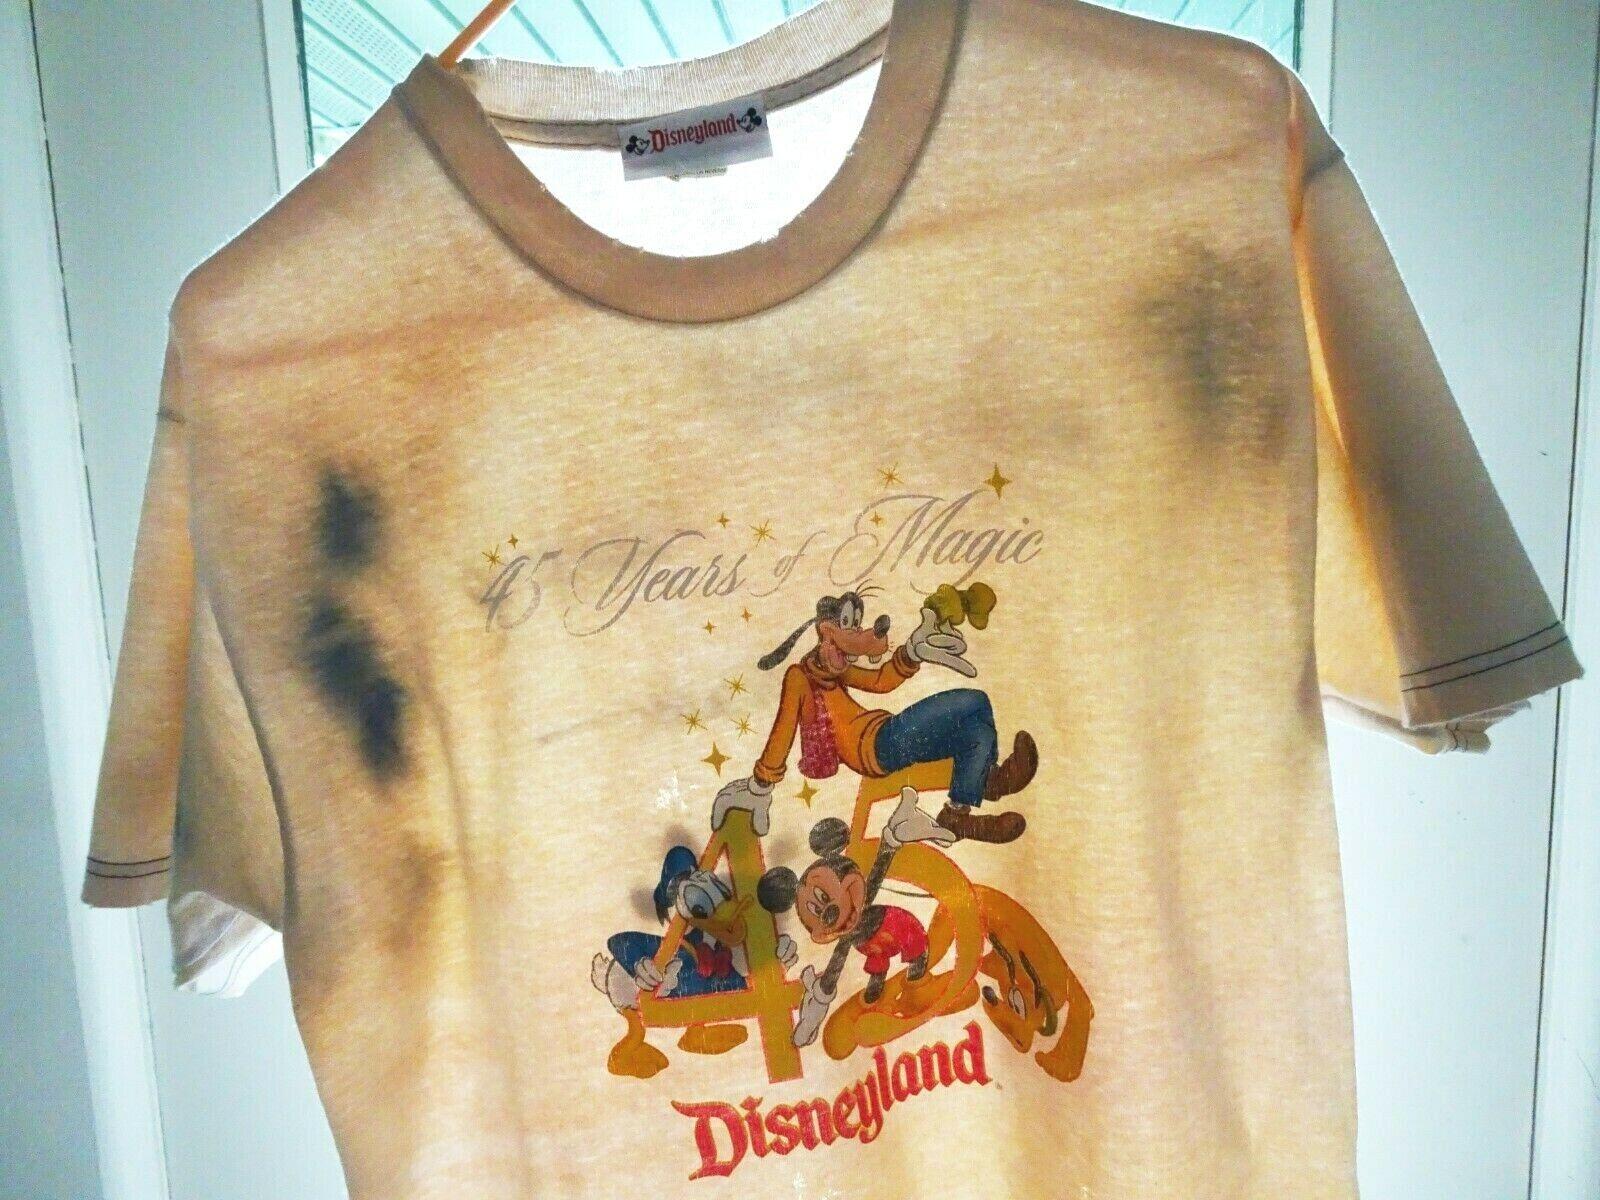 M Vtg 90s Y2K Disneyland CA Mickey Goofy Donald Duck Distressed Thrashed T-Shirt